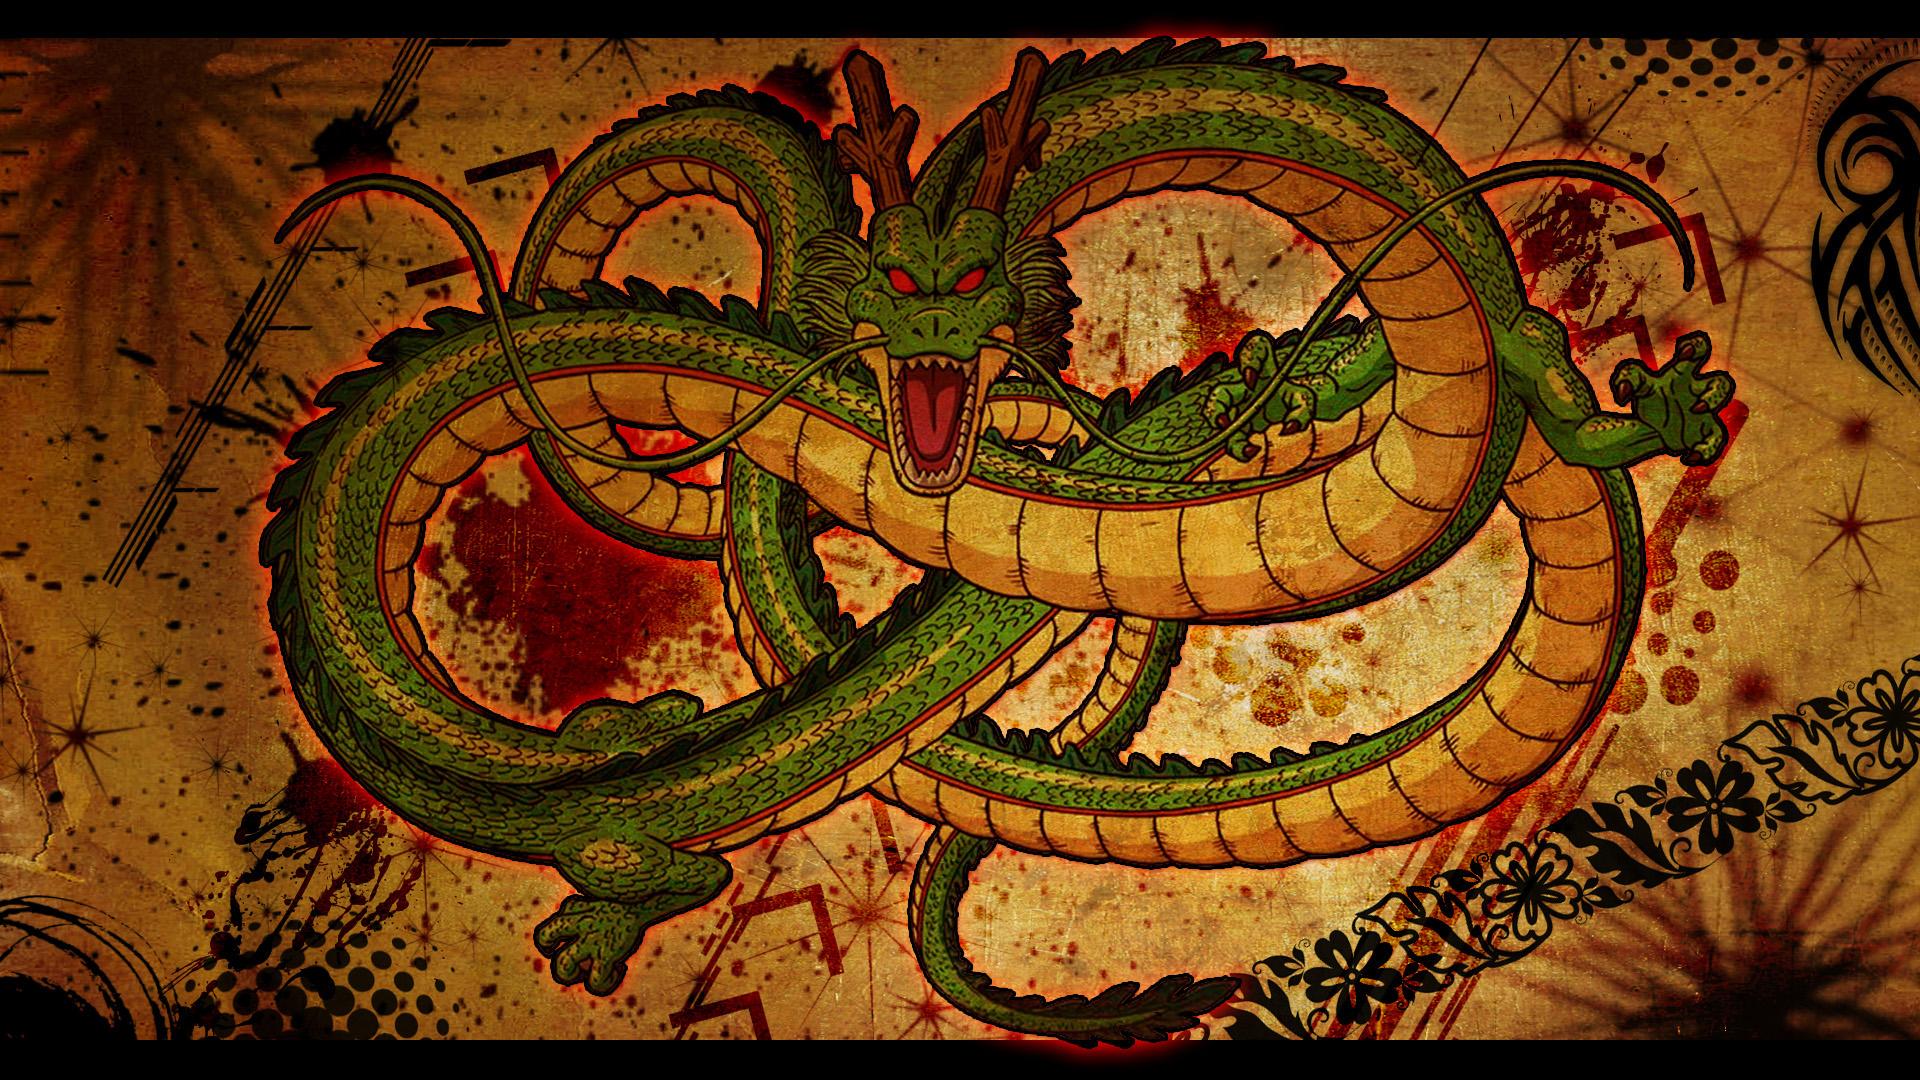 wallpaper shenron ball dragon dragonball dragona 1920x1080